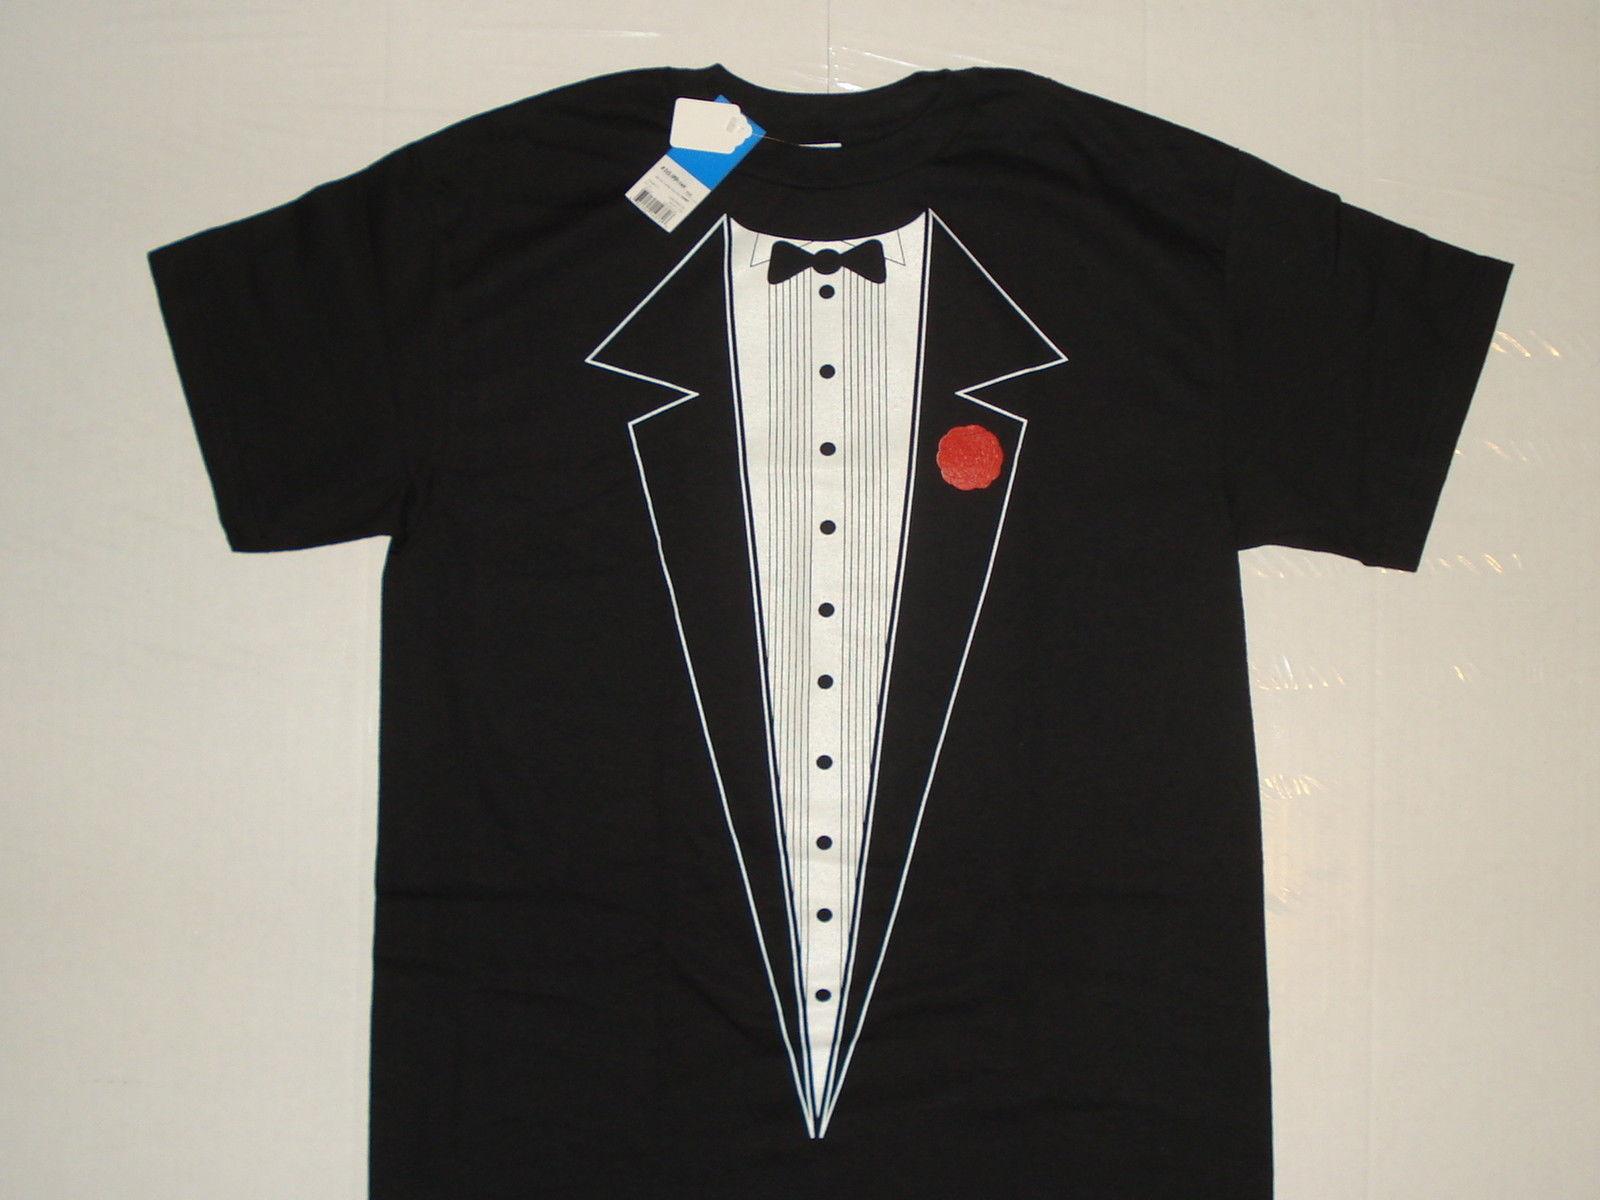 FUNNY TUXEDO ROSE 80s RETRO NEW T-SHIRT S M L XL 2XL PUNK EMO GOTH HUMOR JOKE T Shirt Casual Men Clothing T Shirt Fashion